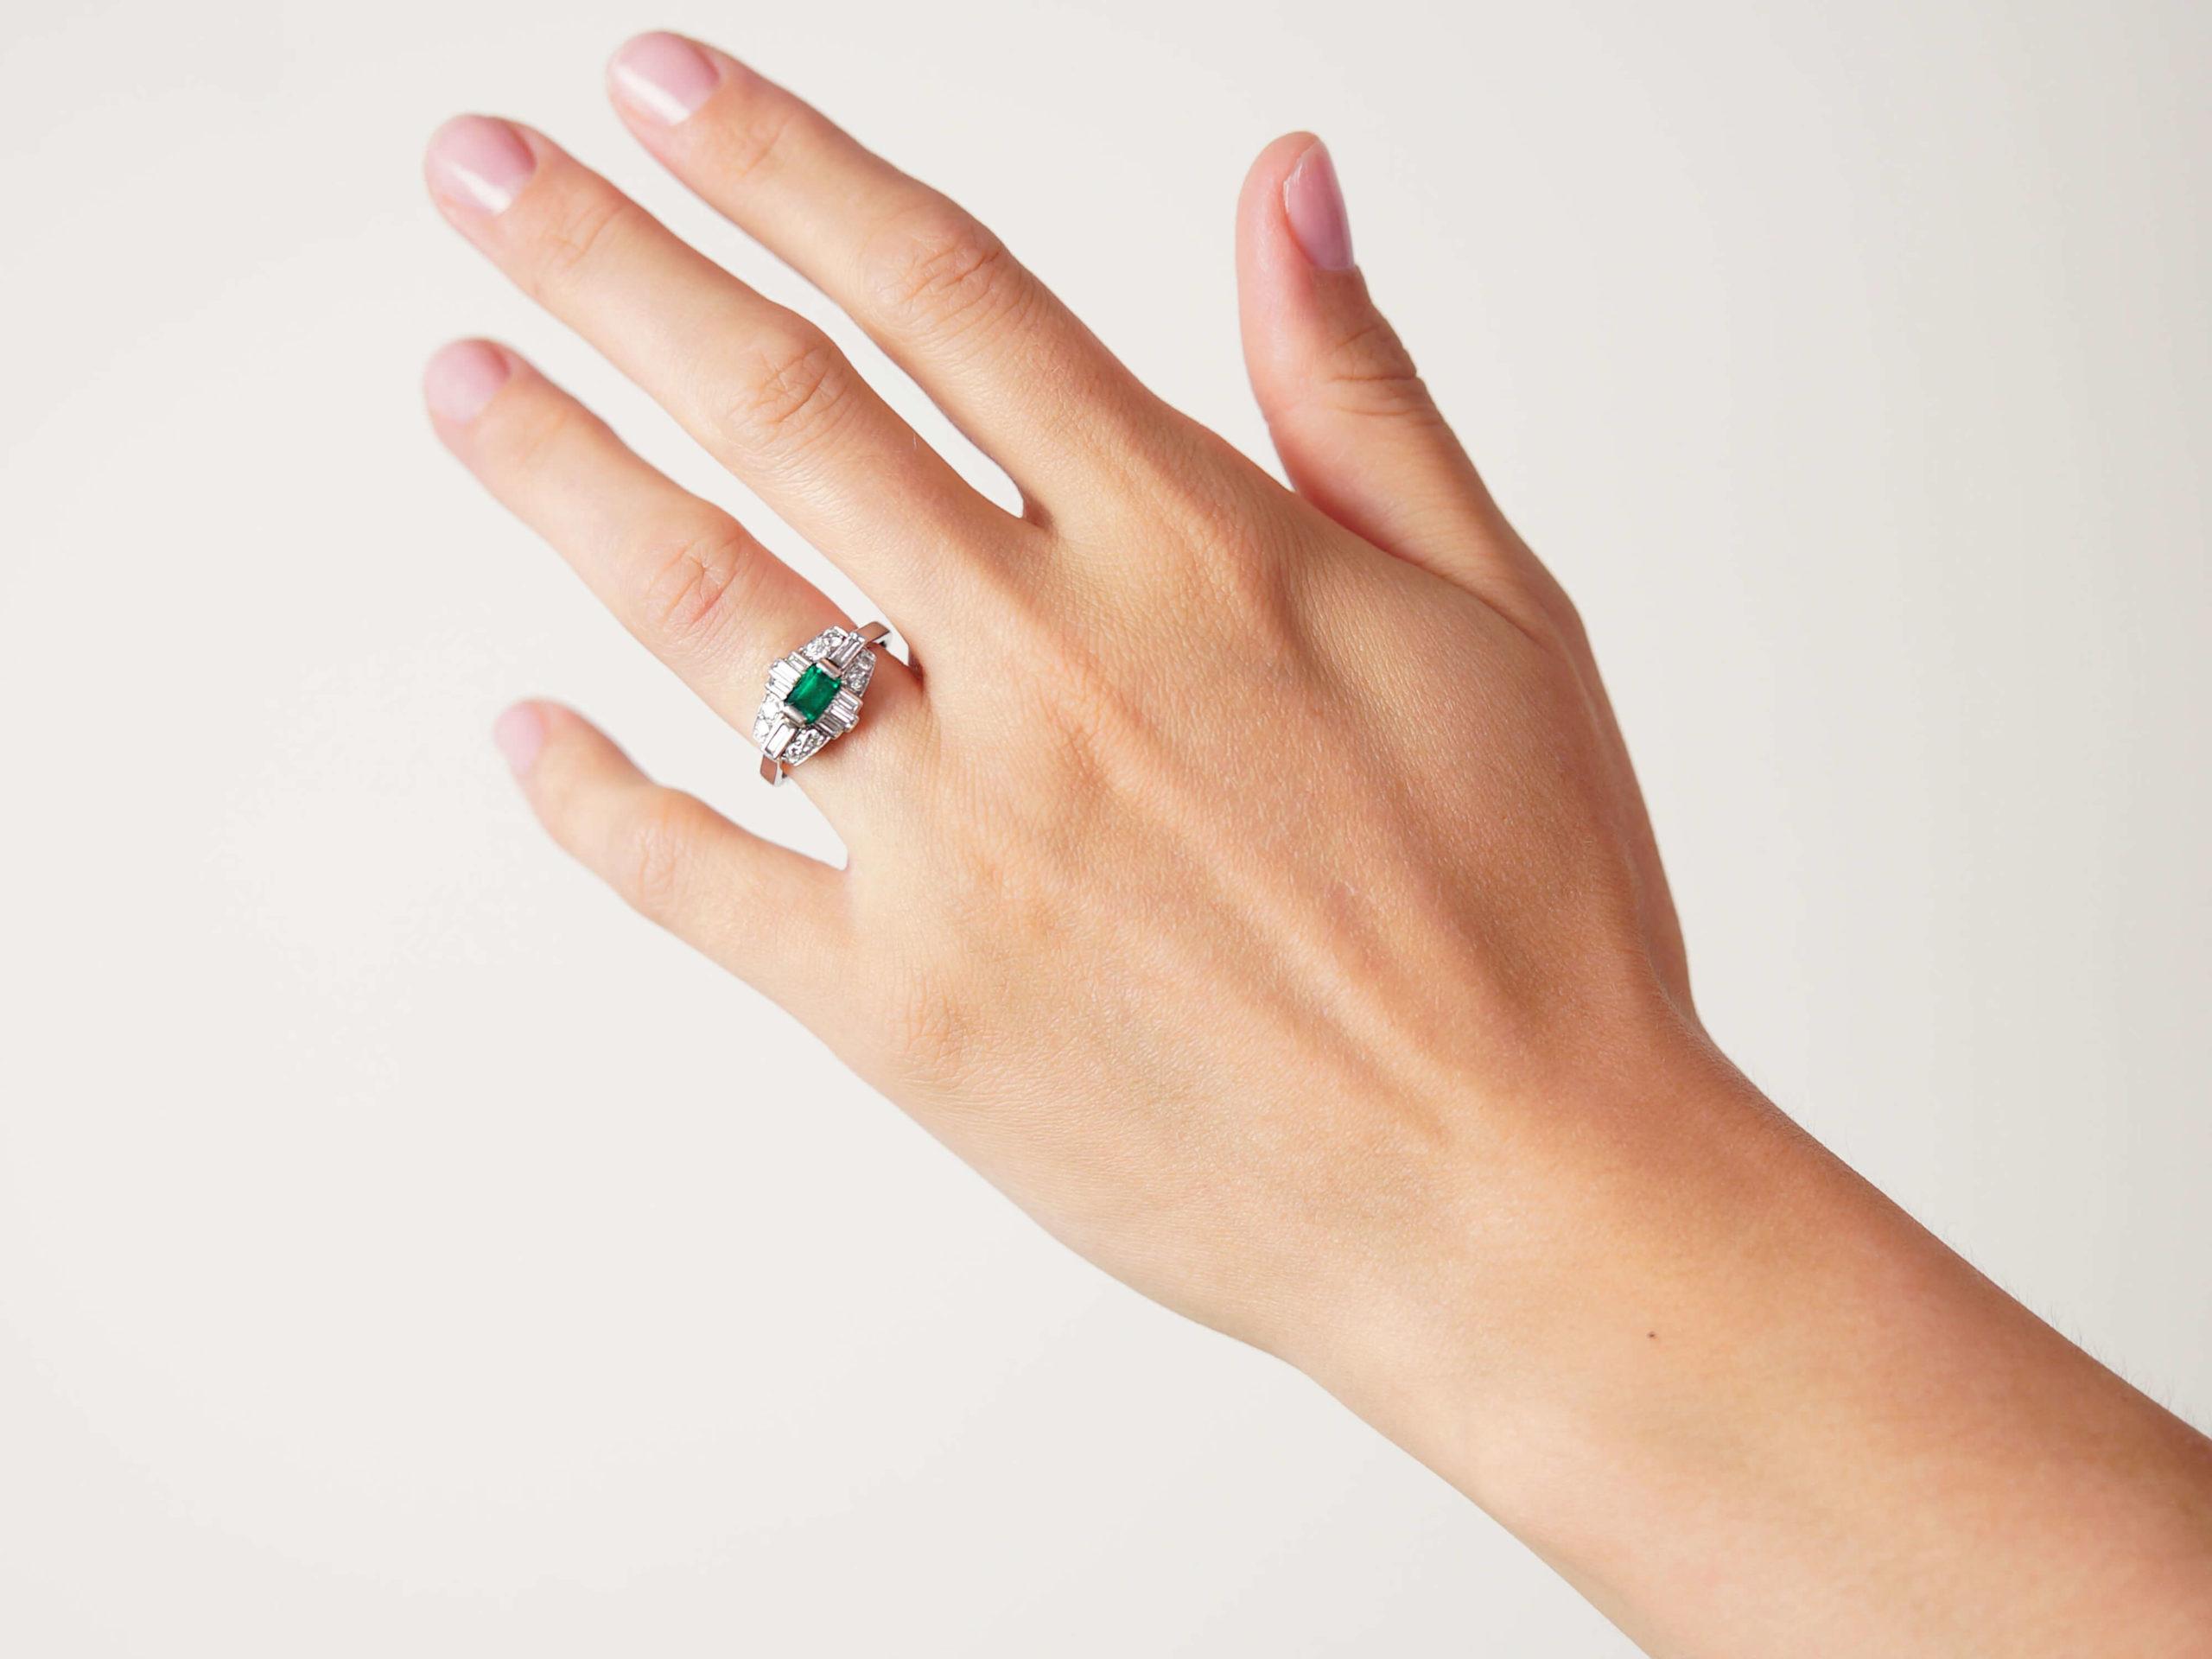 Art Deco Style 18ct White Gold, Emerald & Diamond Ring